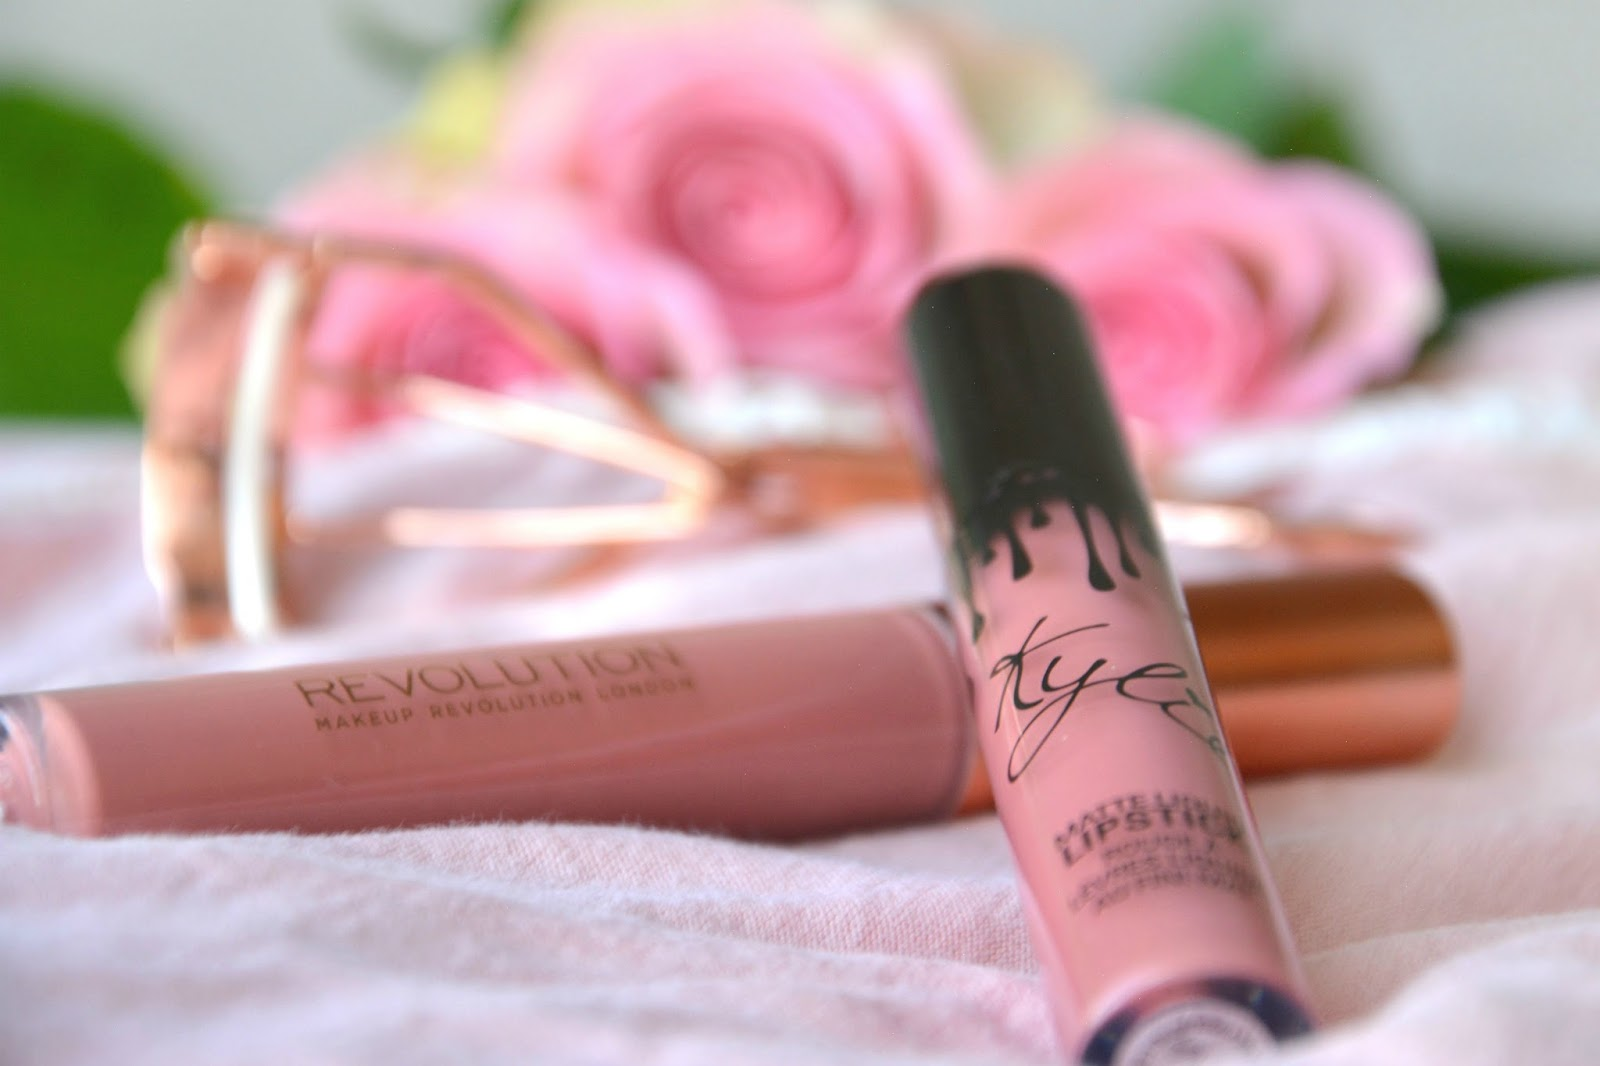 Makeup Revolution Retro Luxe Matte Lip Kit Echelon; Kylie Cosmetics Matte Liquid Lipstick Candy K; Primark Eyelash Curler; Fresh Pink Roses